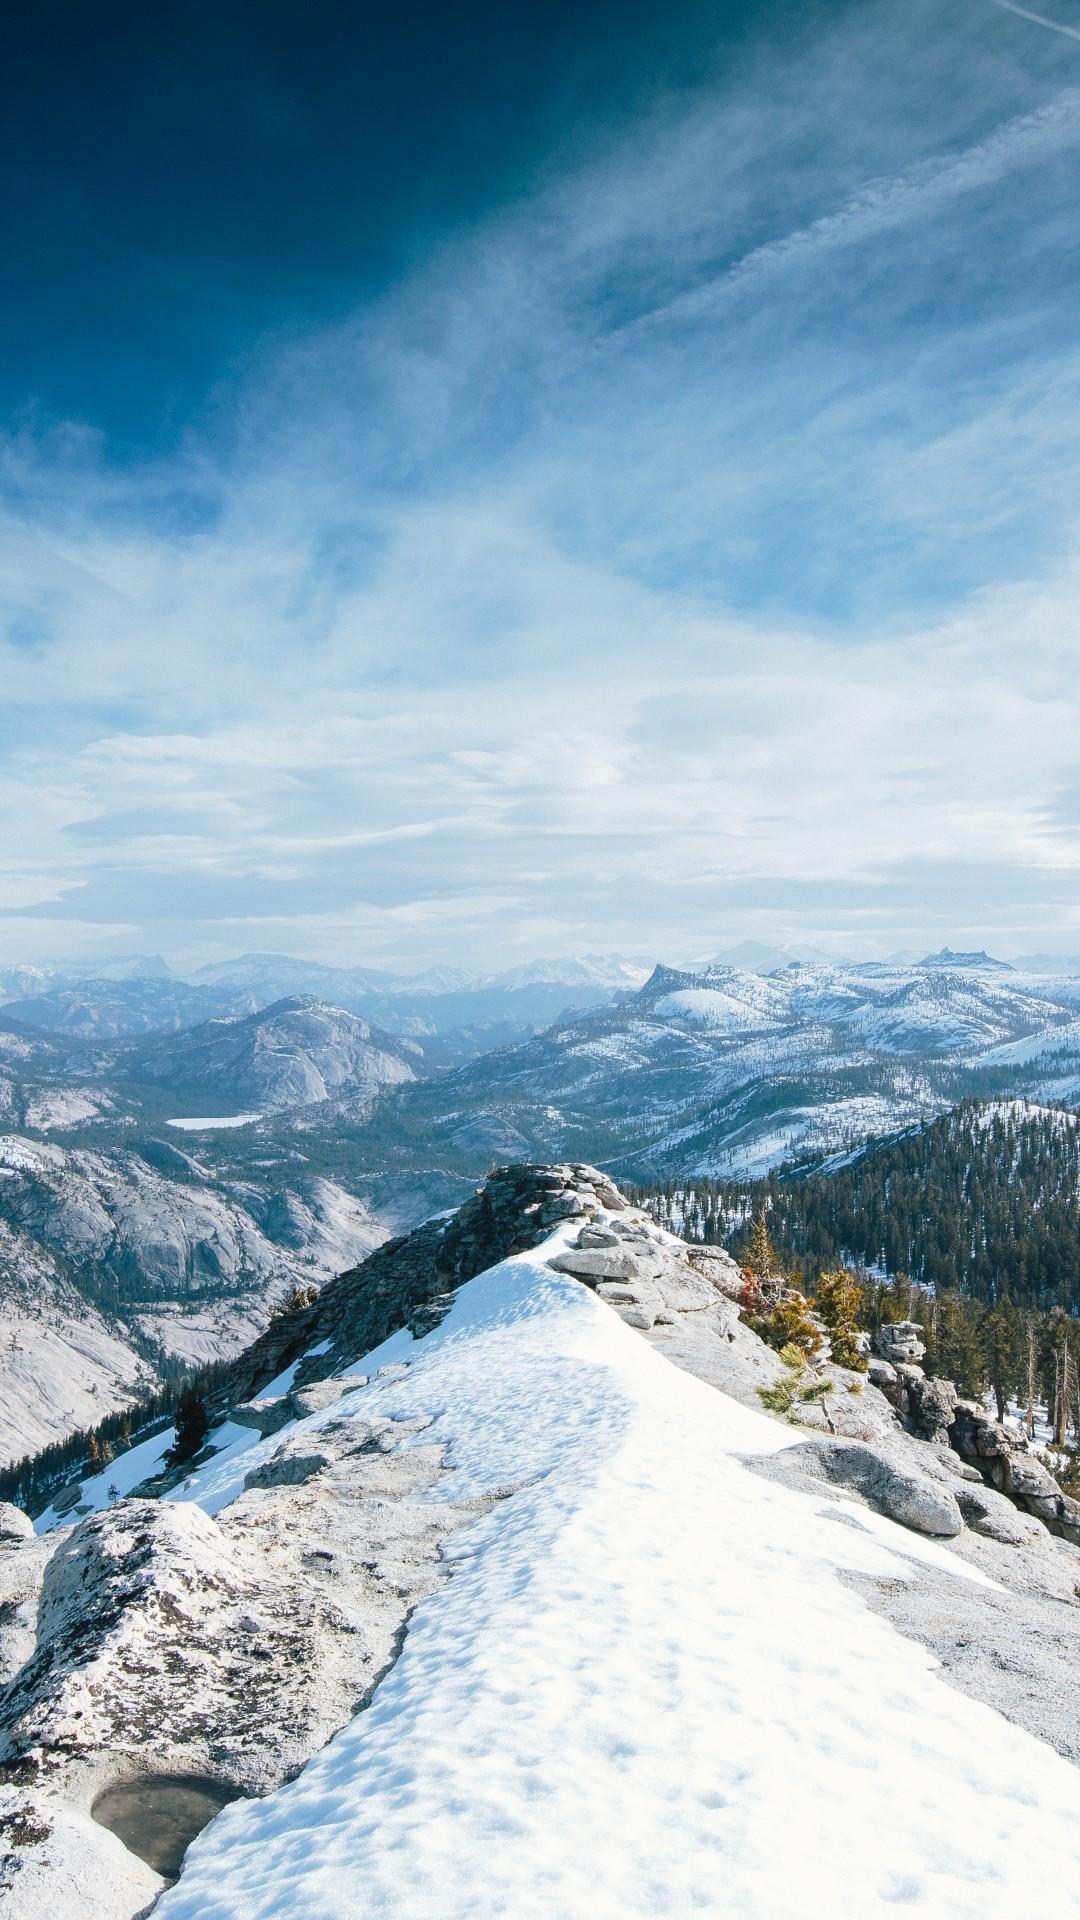 Wallpaper Yosemite, 5K, 4K Wallpaper, 8K, Winter, Snow -7975